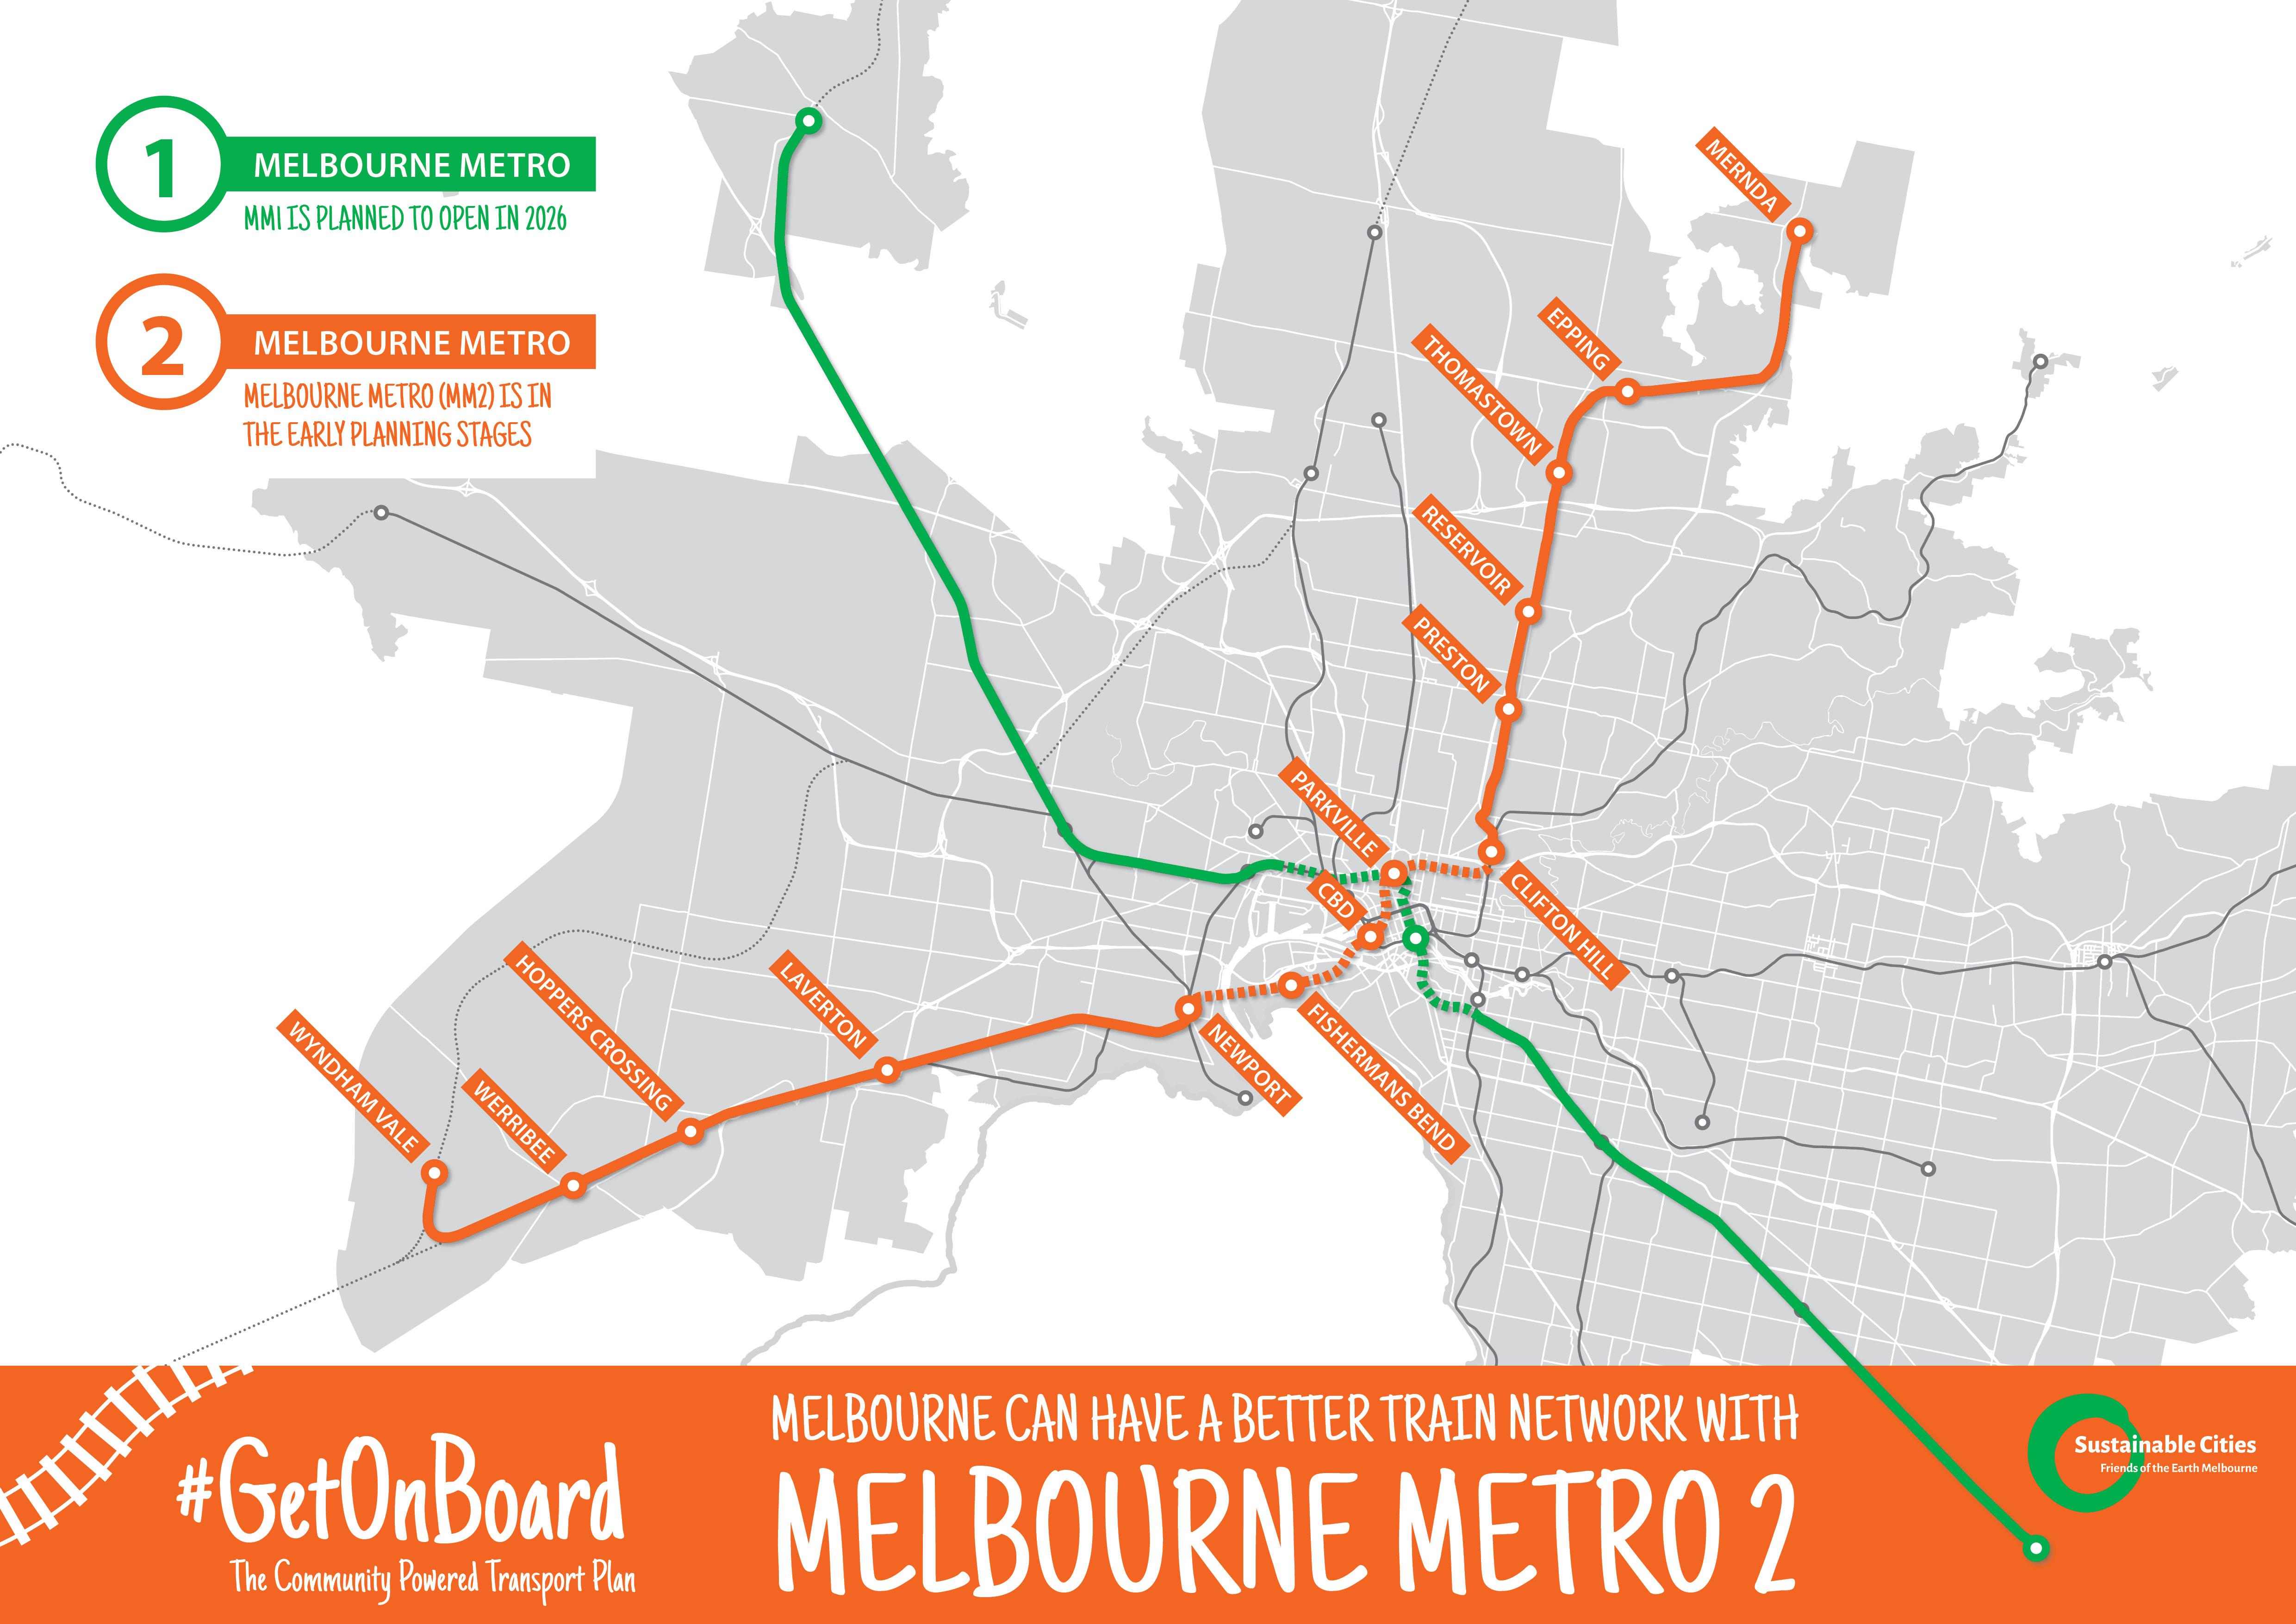 Melbourne Metro 2